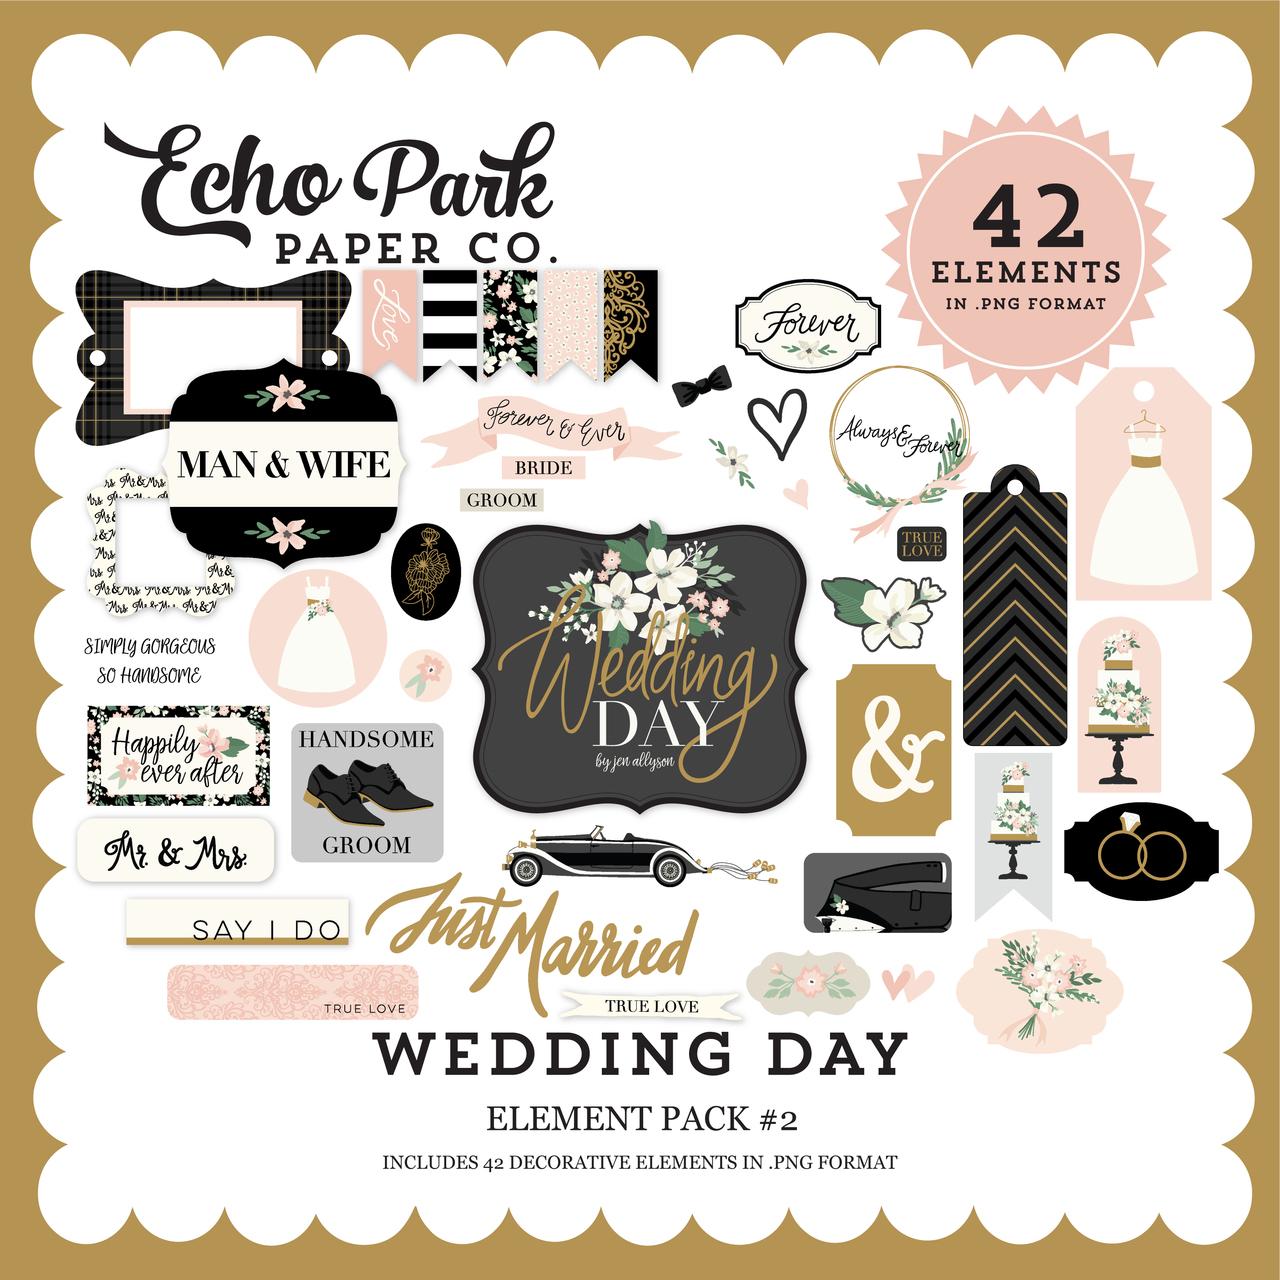 Wedding Day Element Pack #2